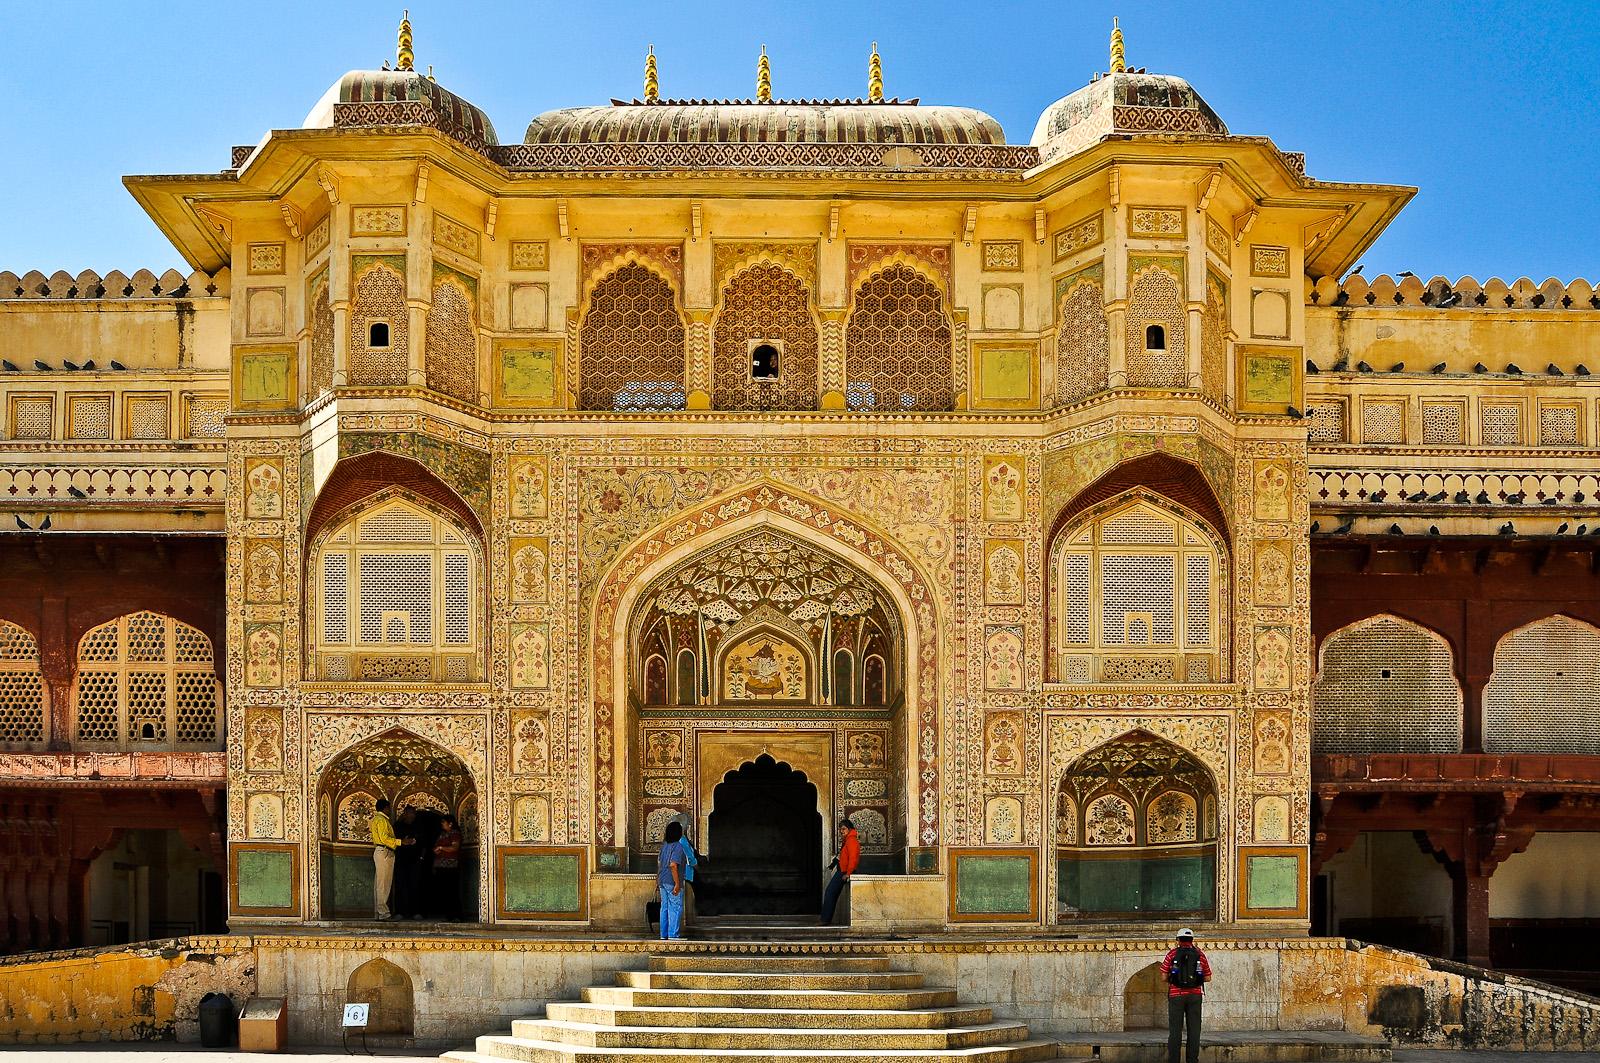 Fort Amber bei Jaipur in Rajasthan